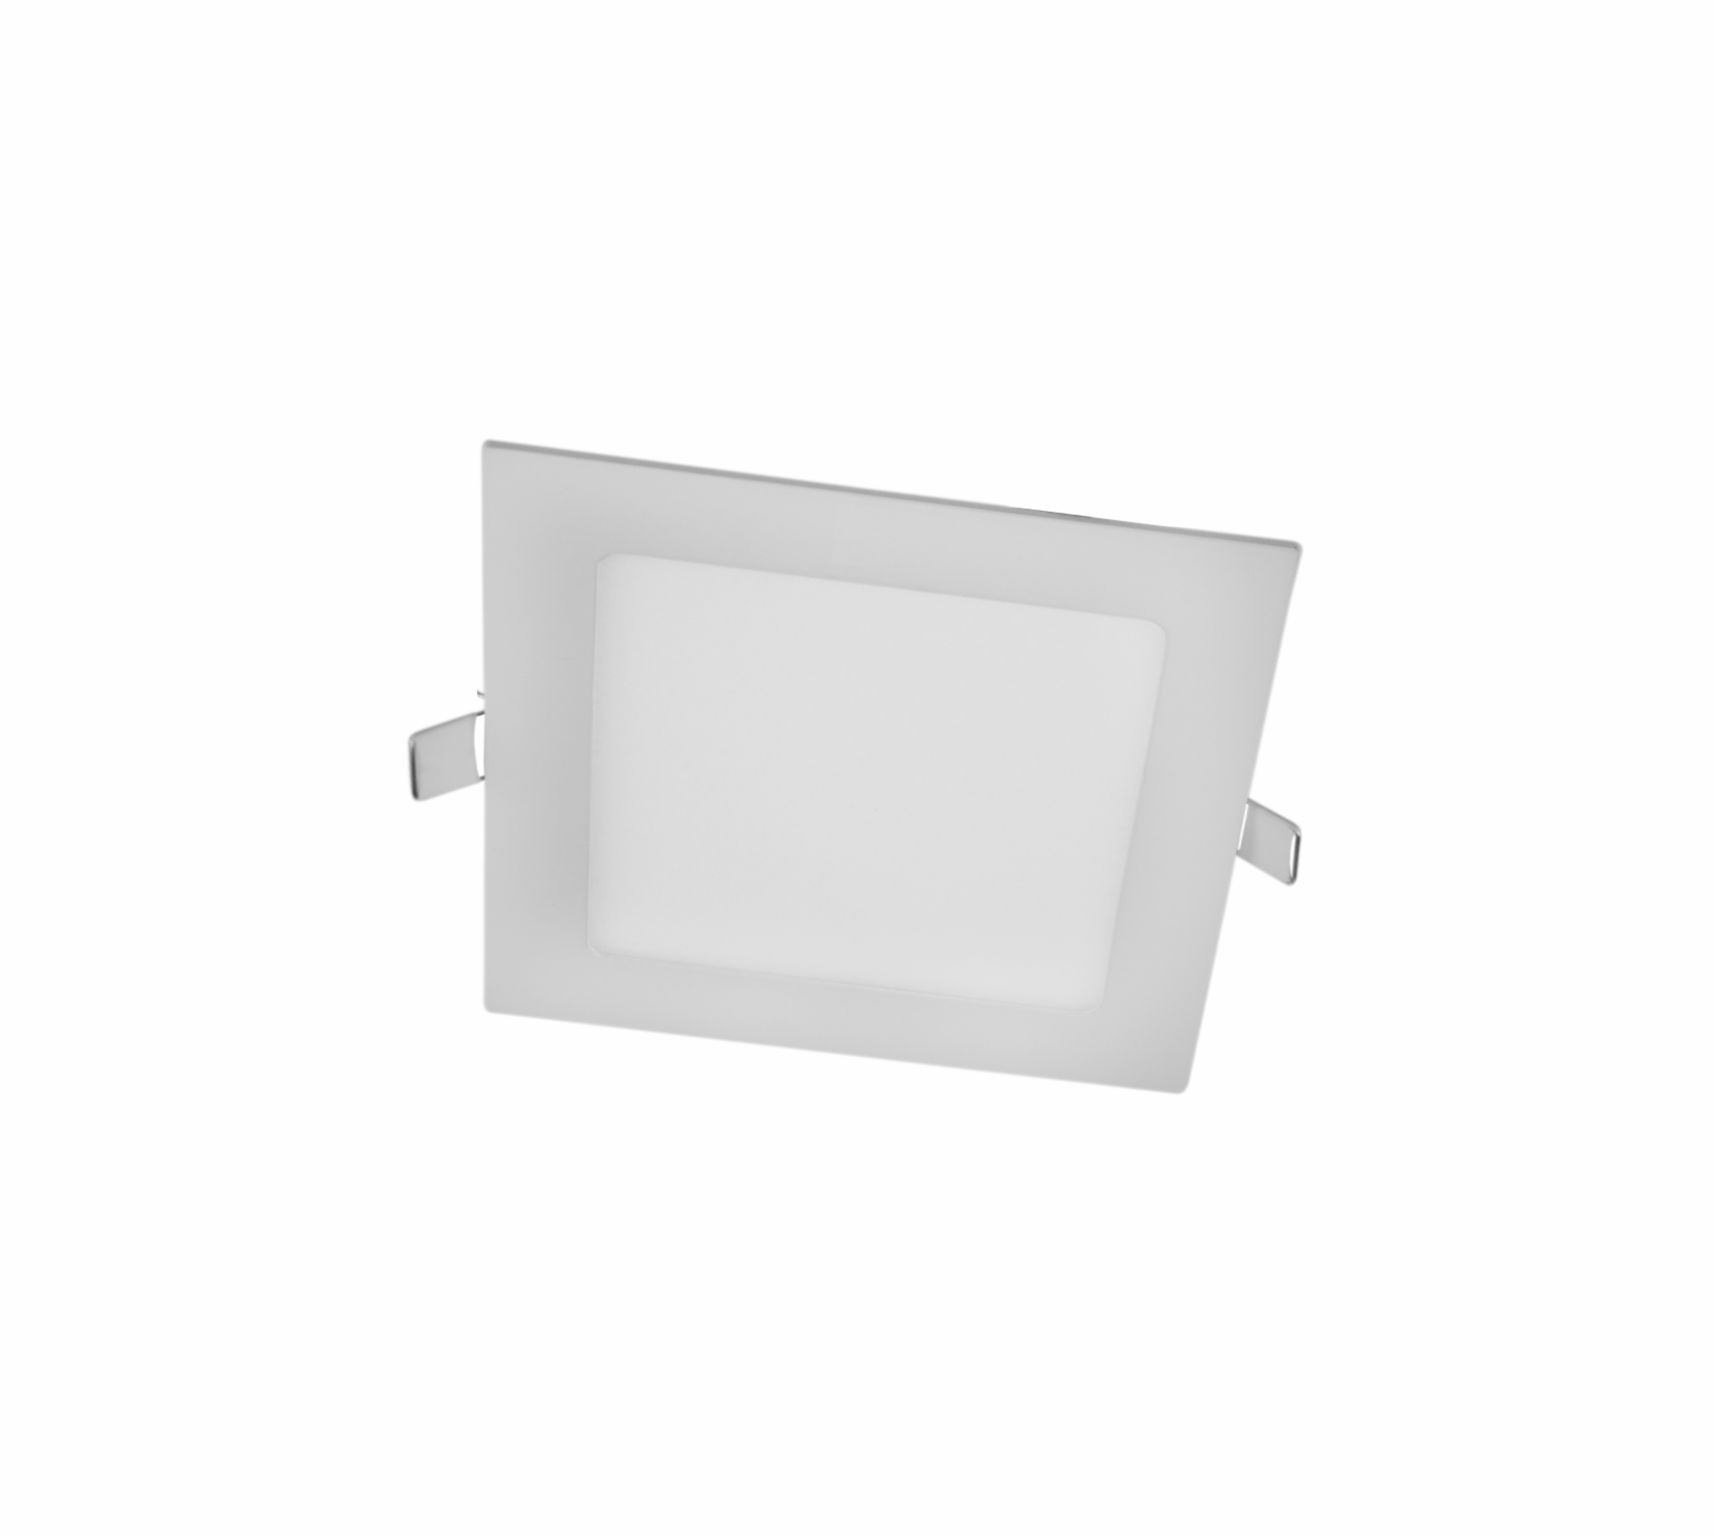 PAINELSLIMLED-PROJETO-QD-E-120-18-65-3C <span>(caixa)</span><br/>